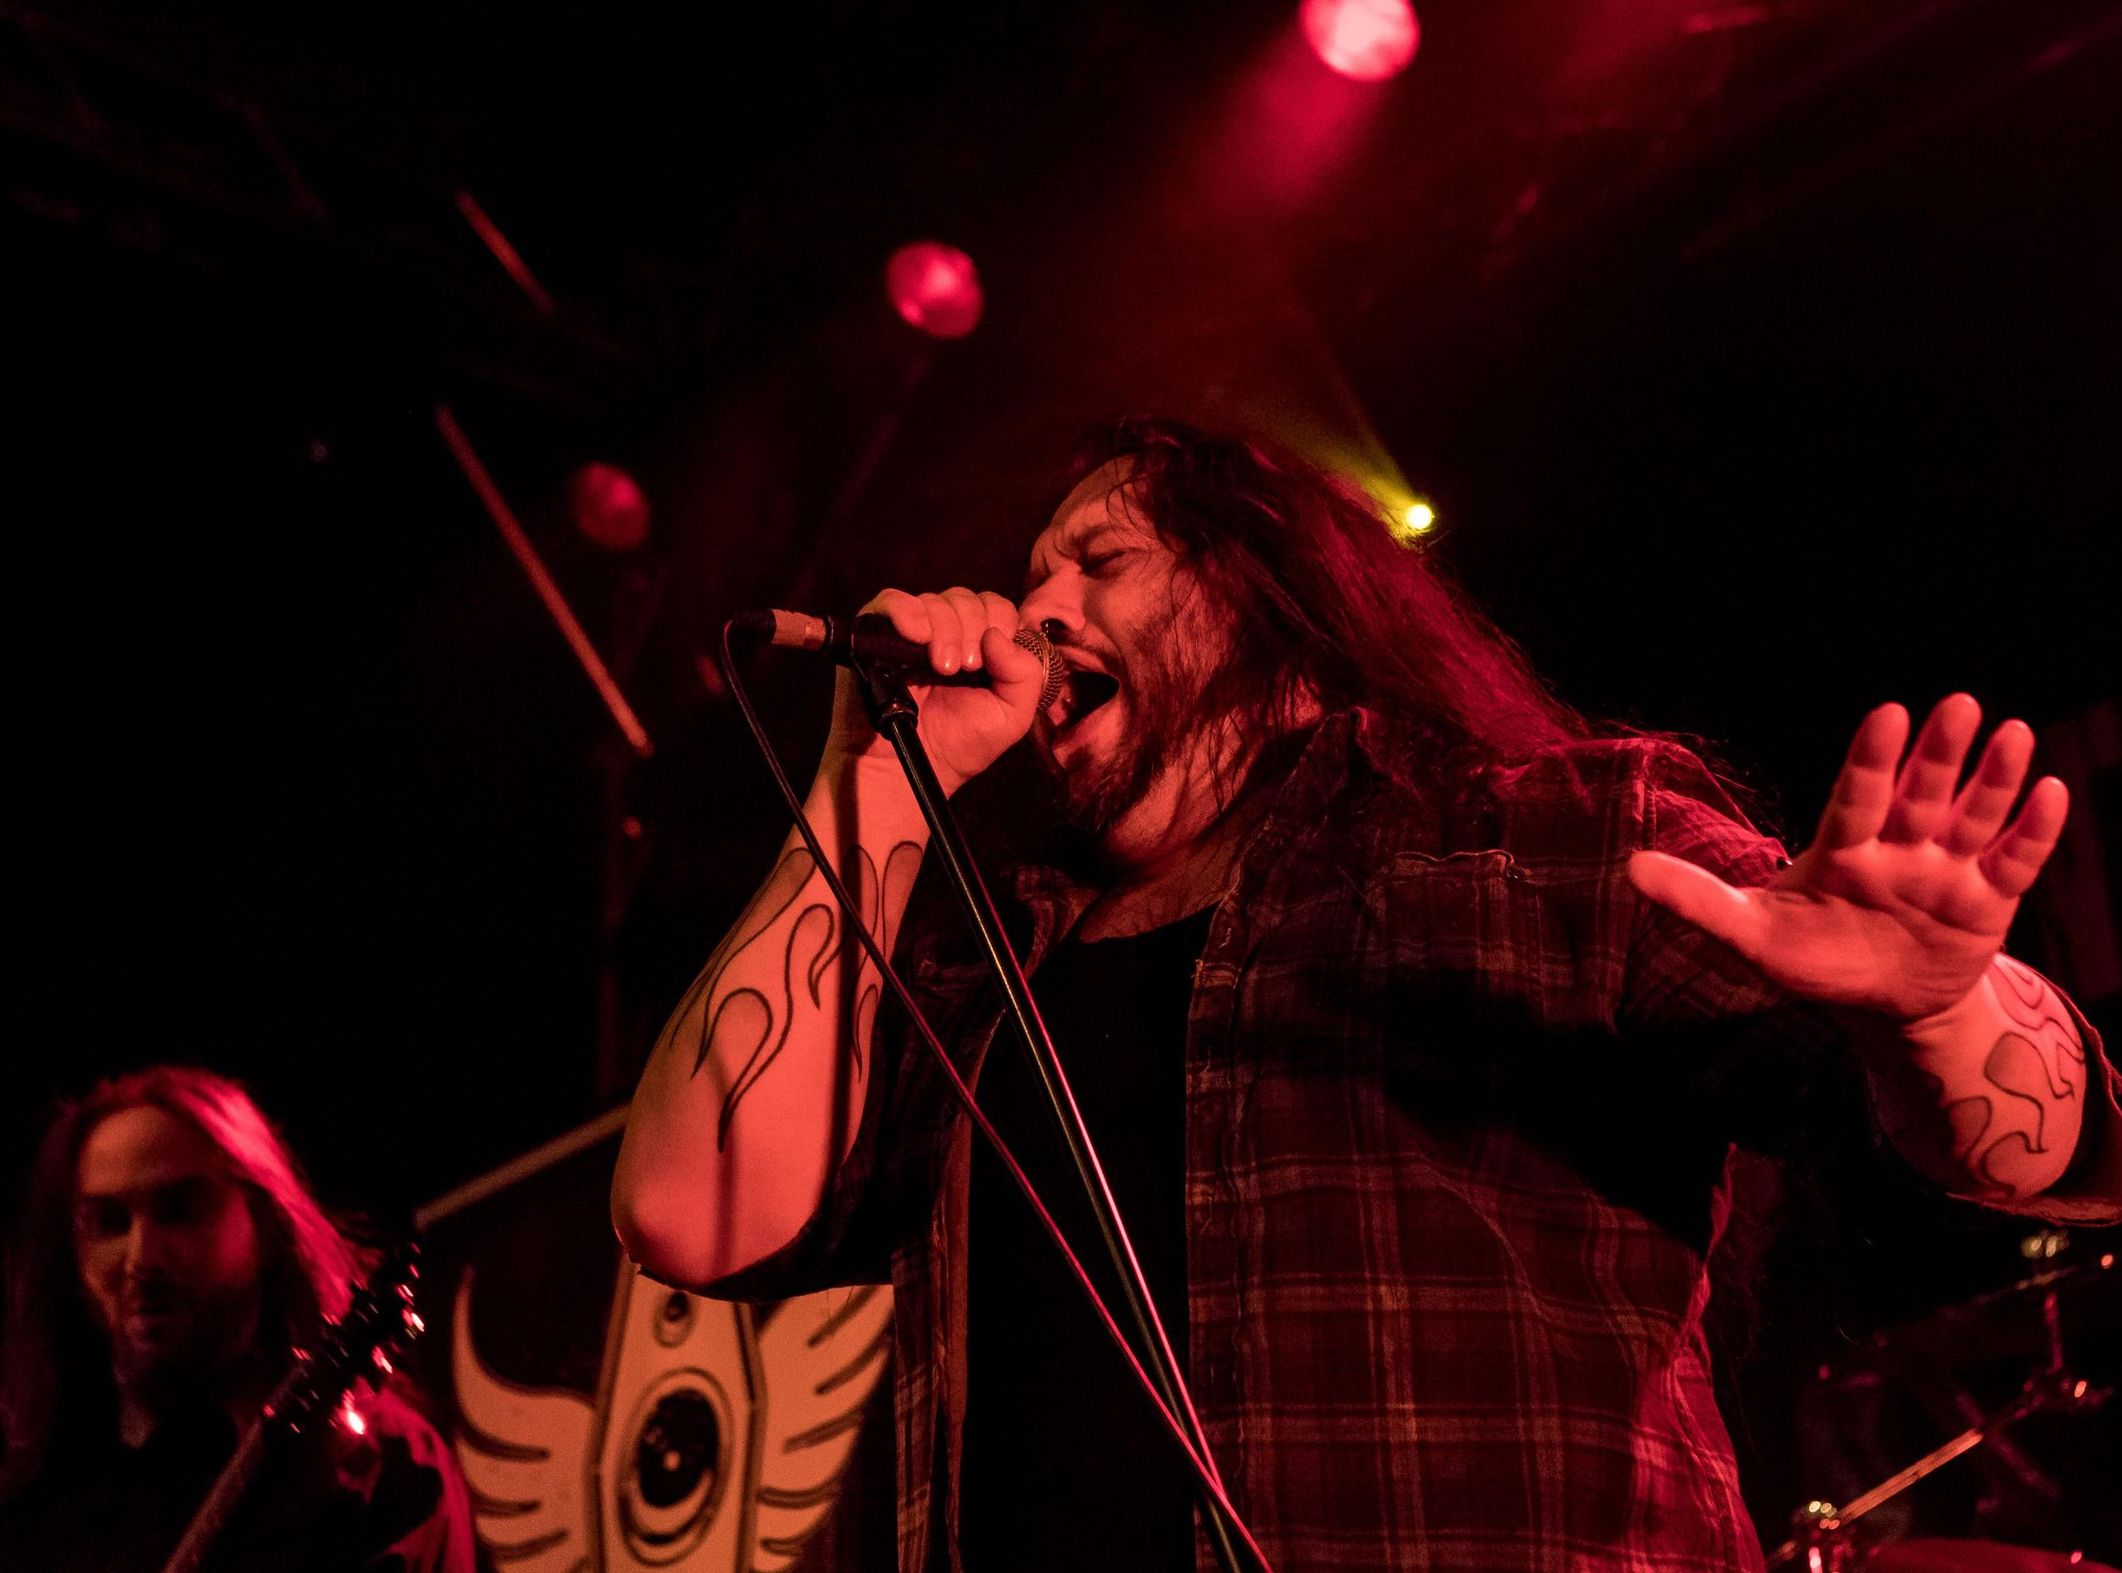 the-very-end-live-zeche-carl-essen-germany-thrash-metal_11